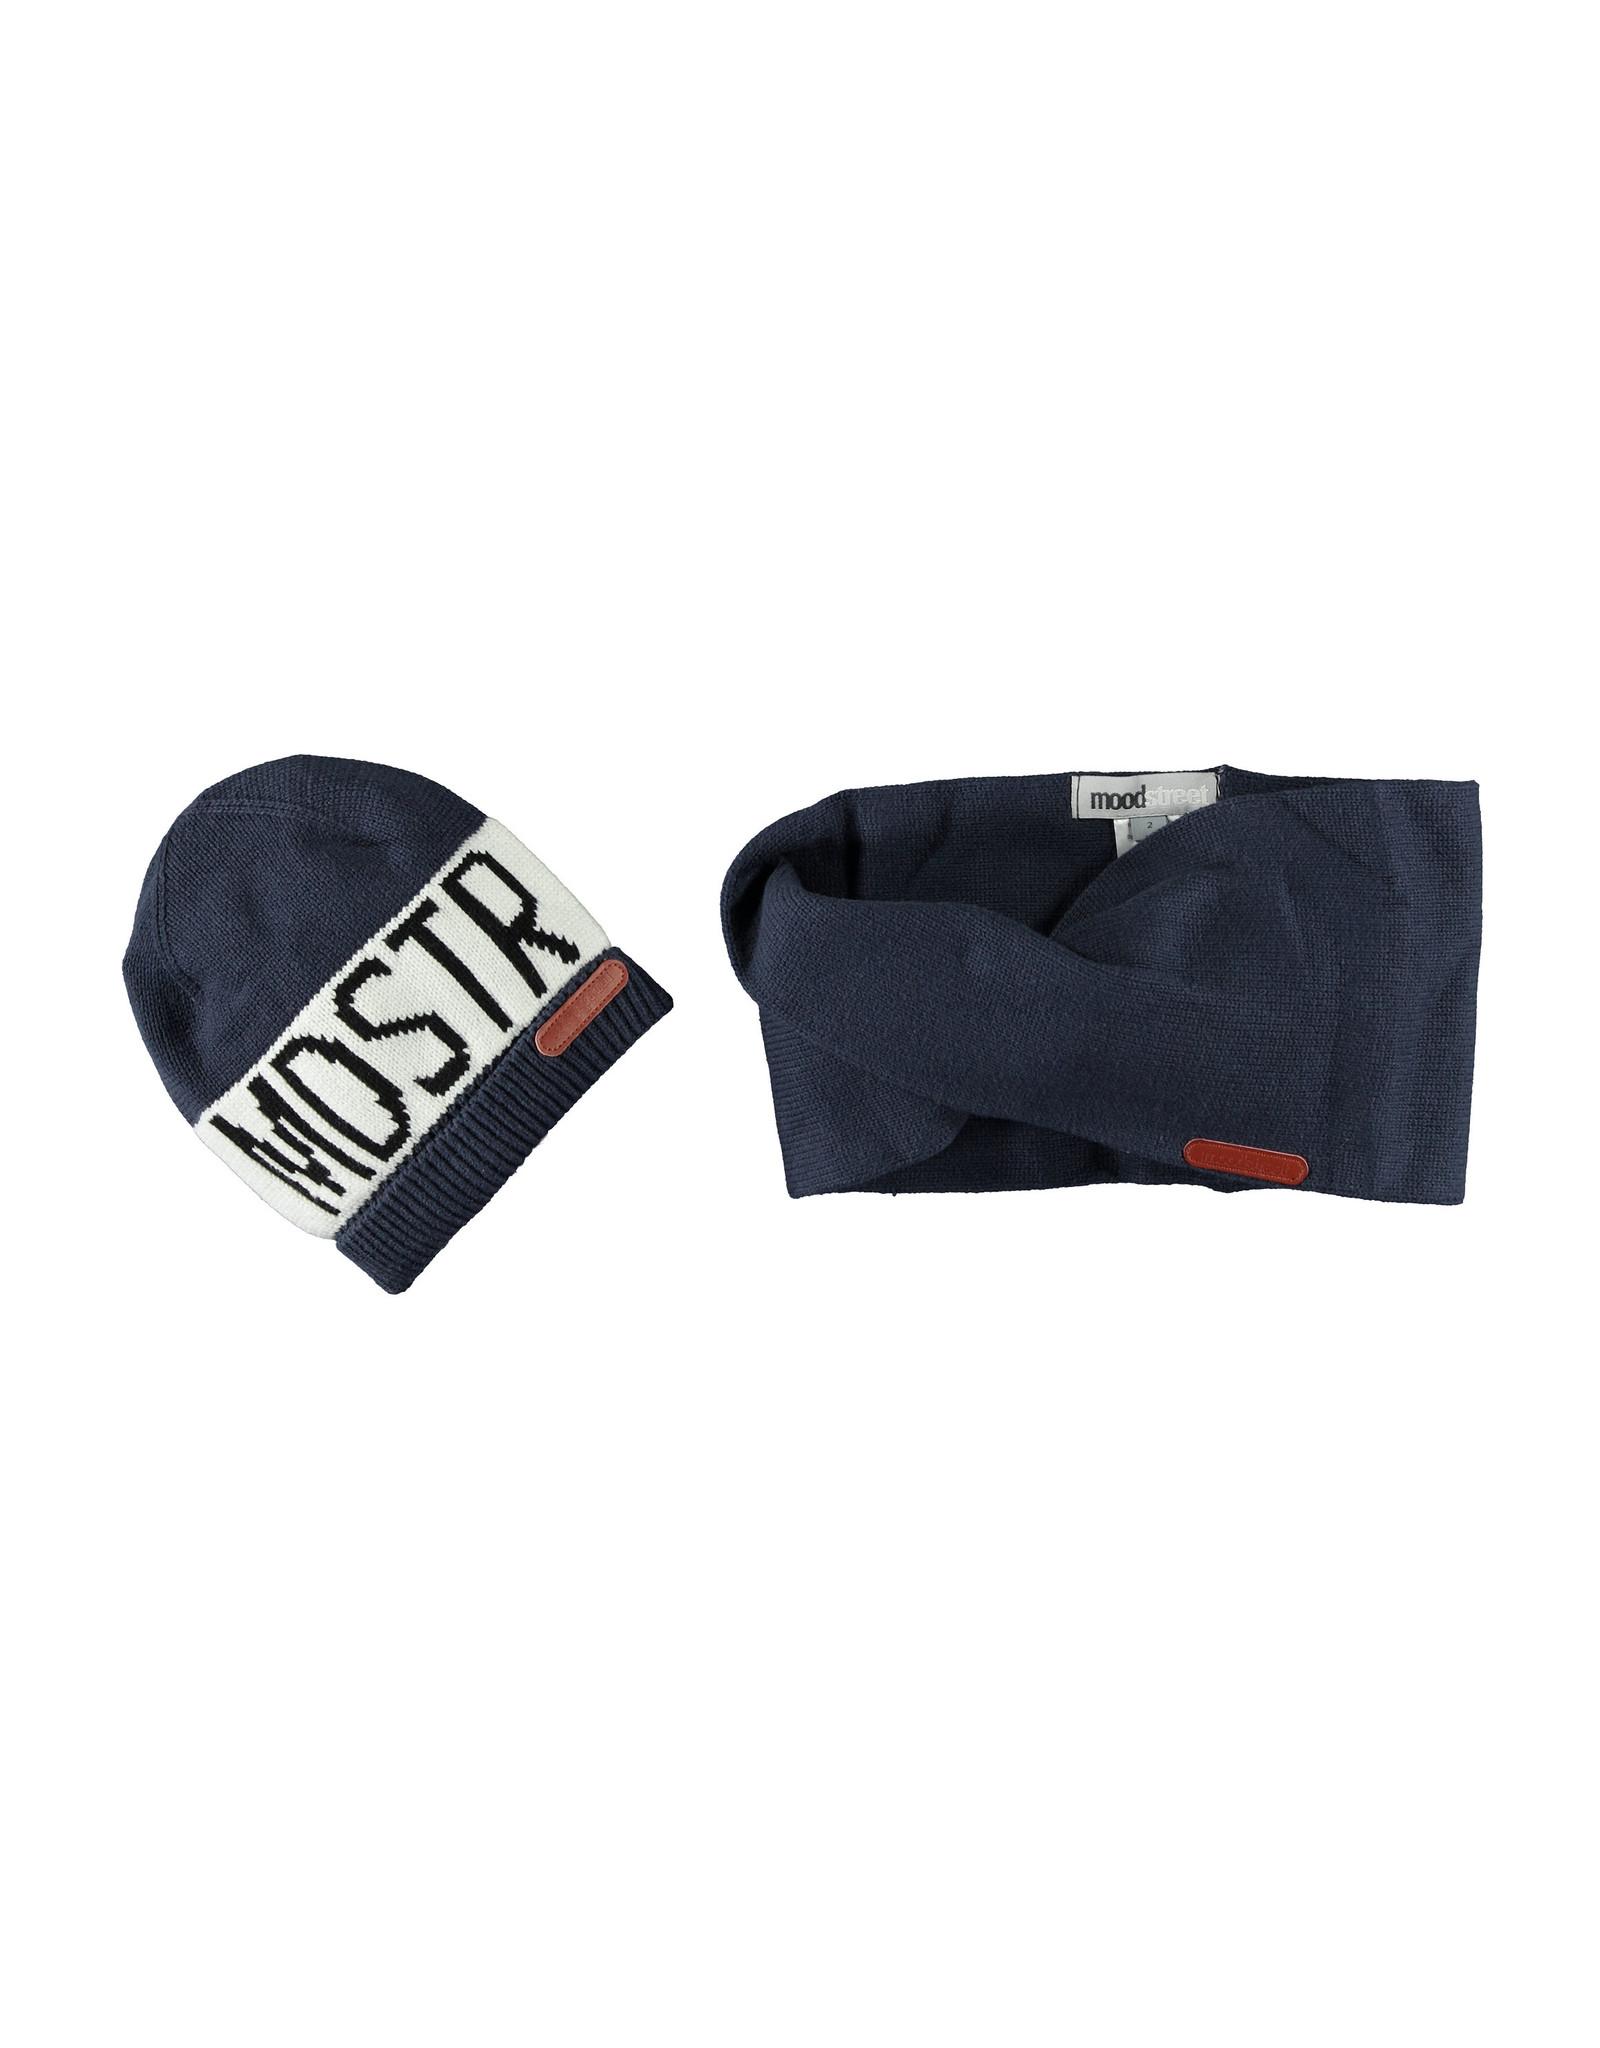 Moodstreet Moodstreet Boys 2pc set accessories (hat/scarf) Navy